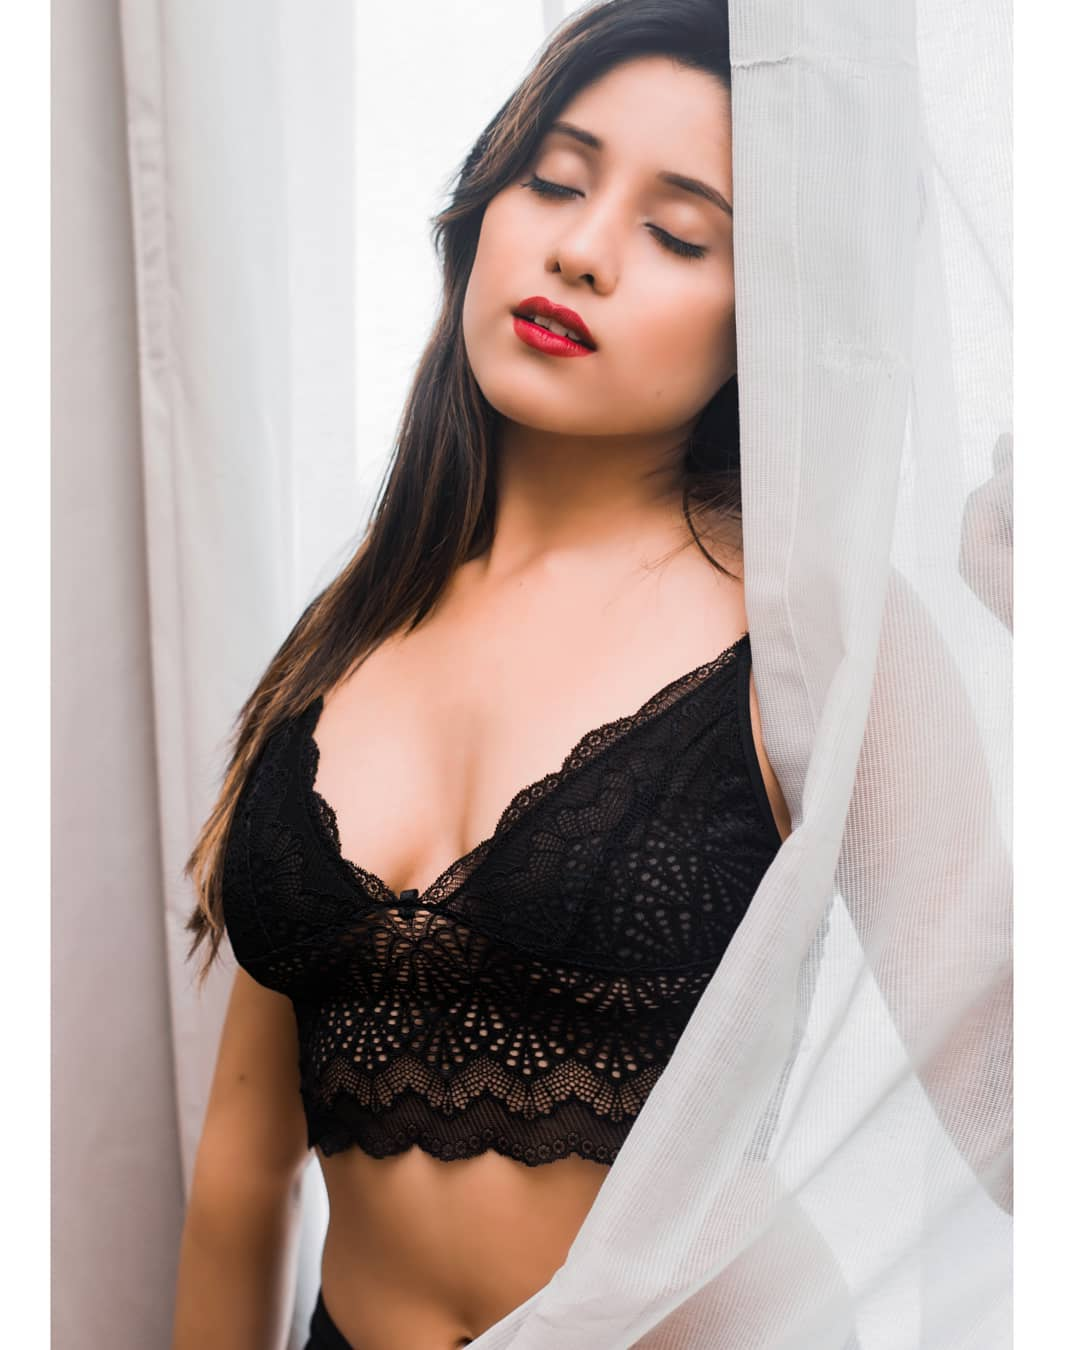 desi randi nangi pics 3 - Desi Randi Ki chudai Sexy Nude Gand Chut Pics